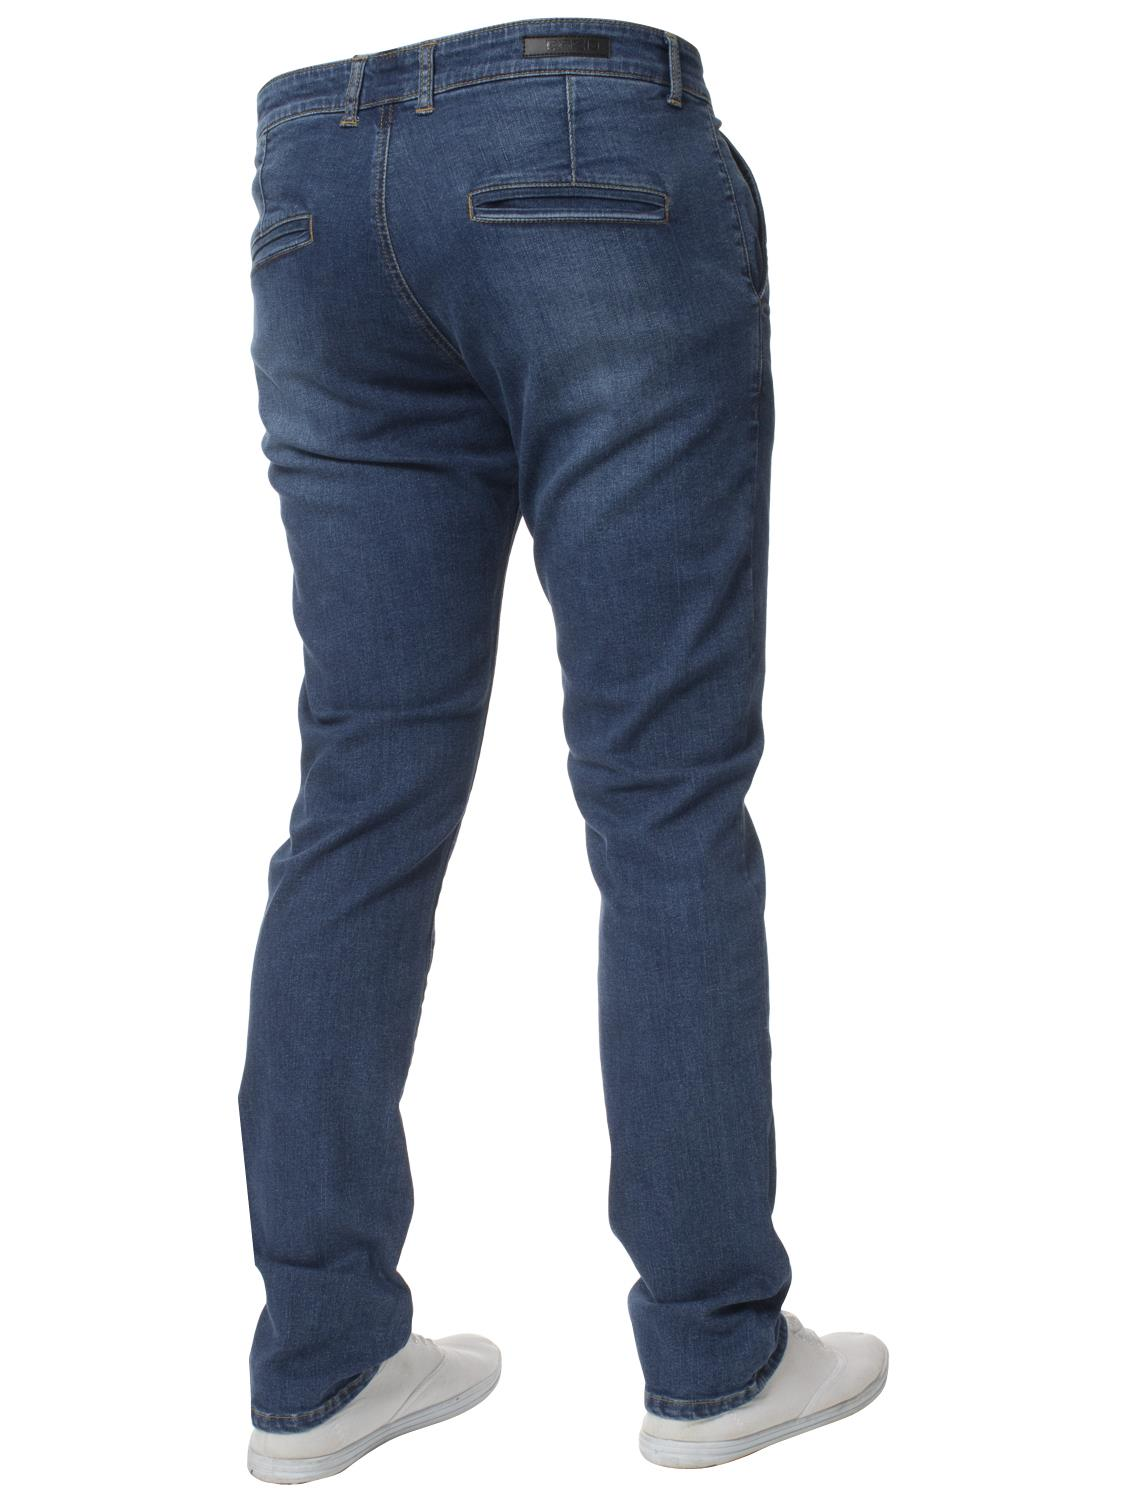 ENZO-Jeans-para-hombre-Big-Alto-Pierna-King-Size-Jeans-Pantalones-Chino-Pantalones-Pantalones-44-034 miniatura 35